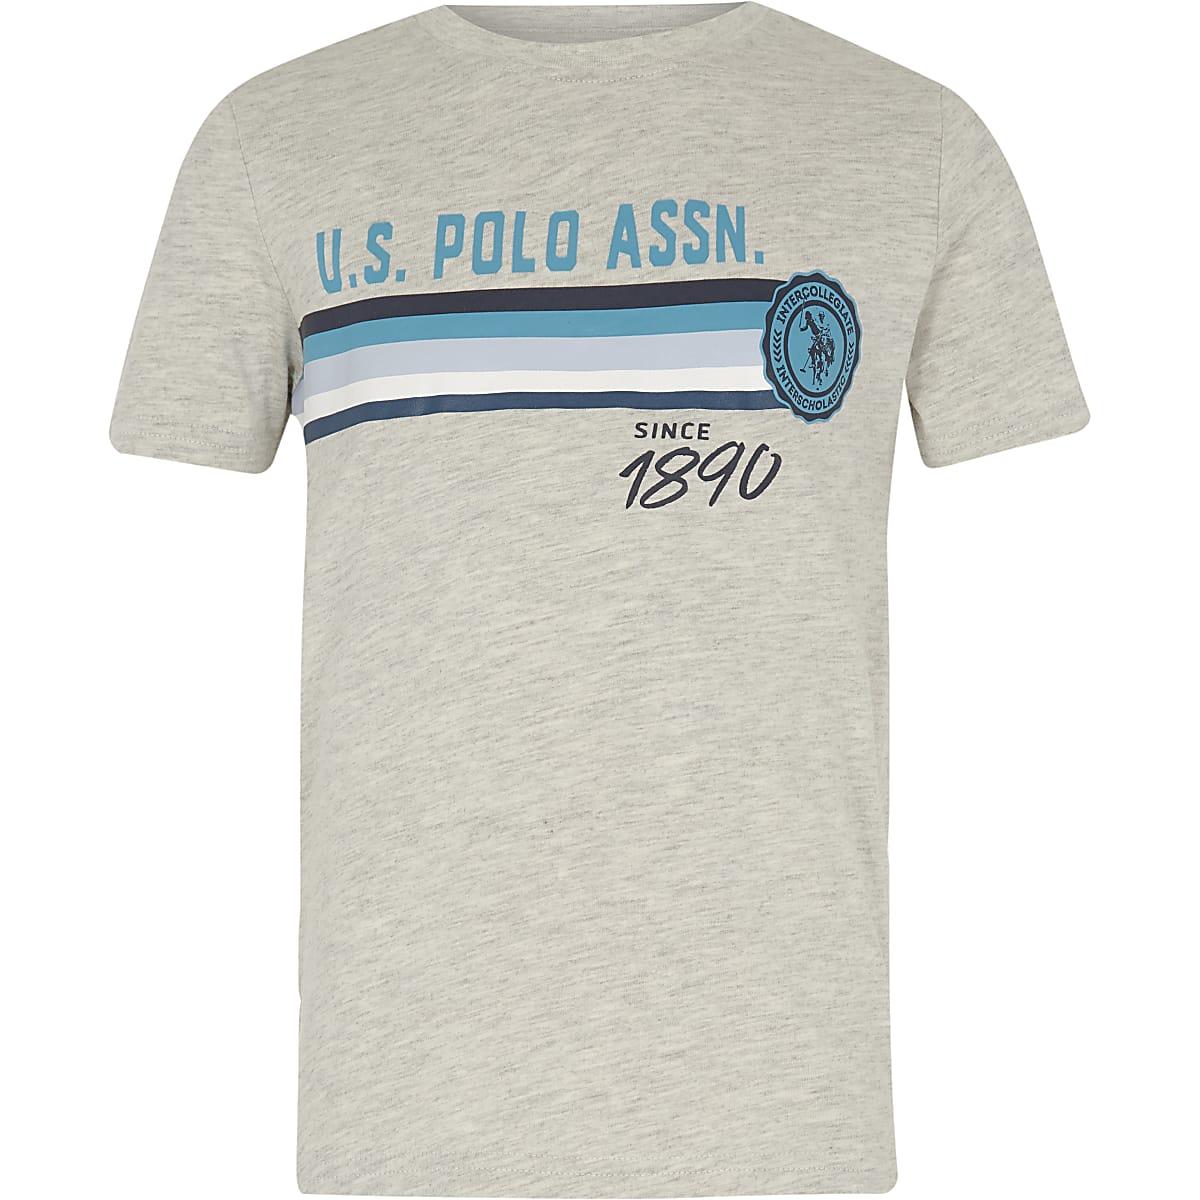 Boys grey U.S. Polo Assn. print T-shirt